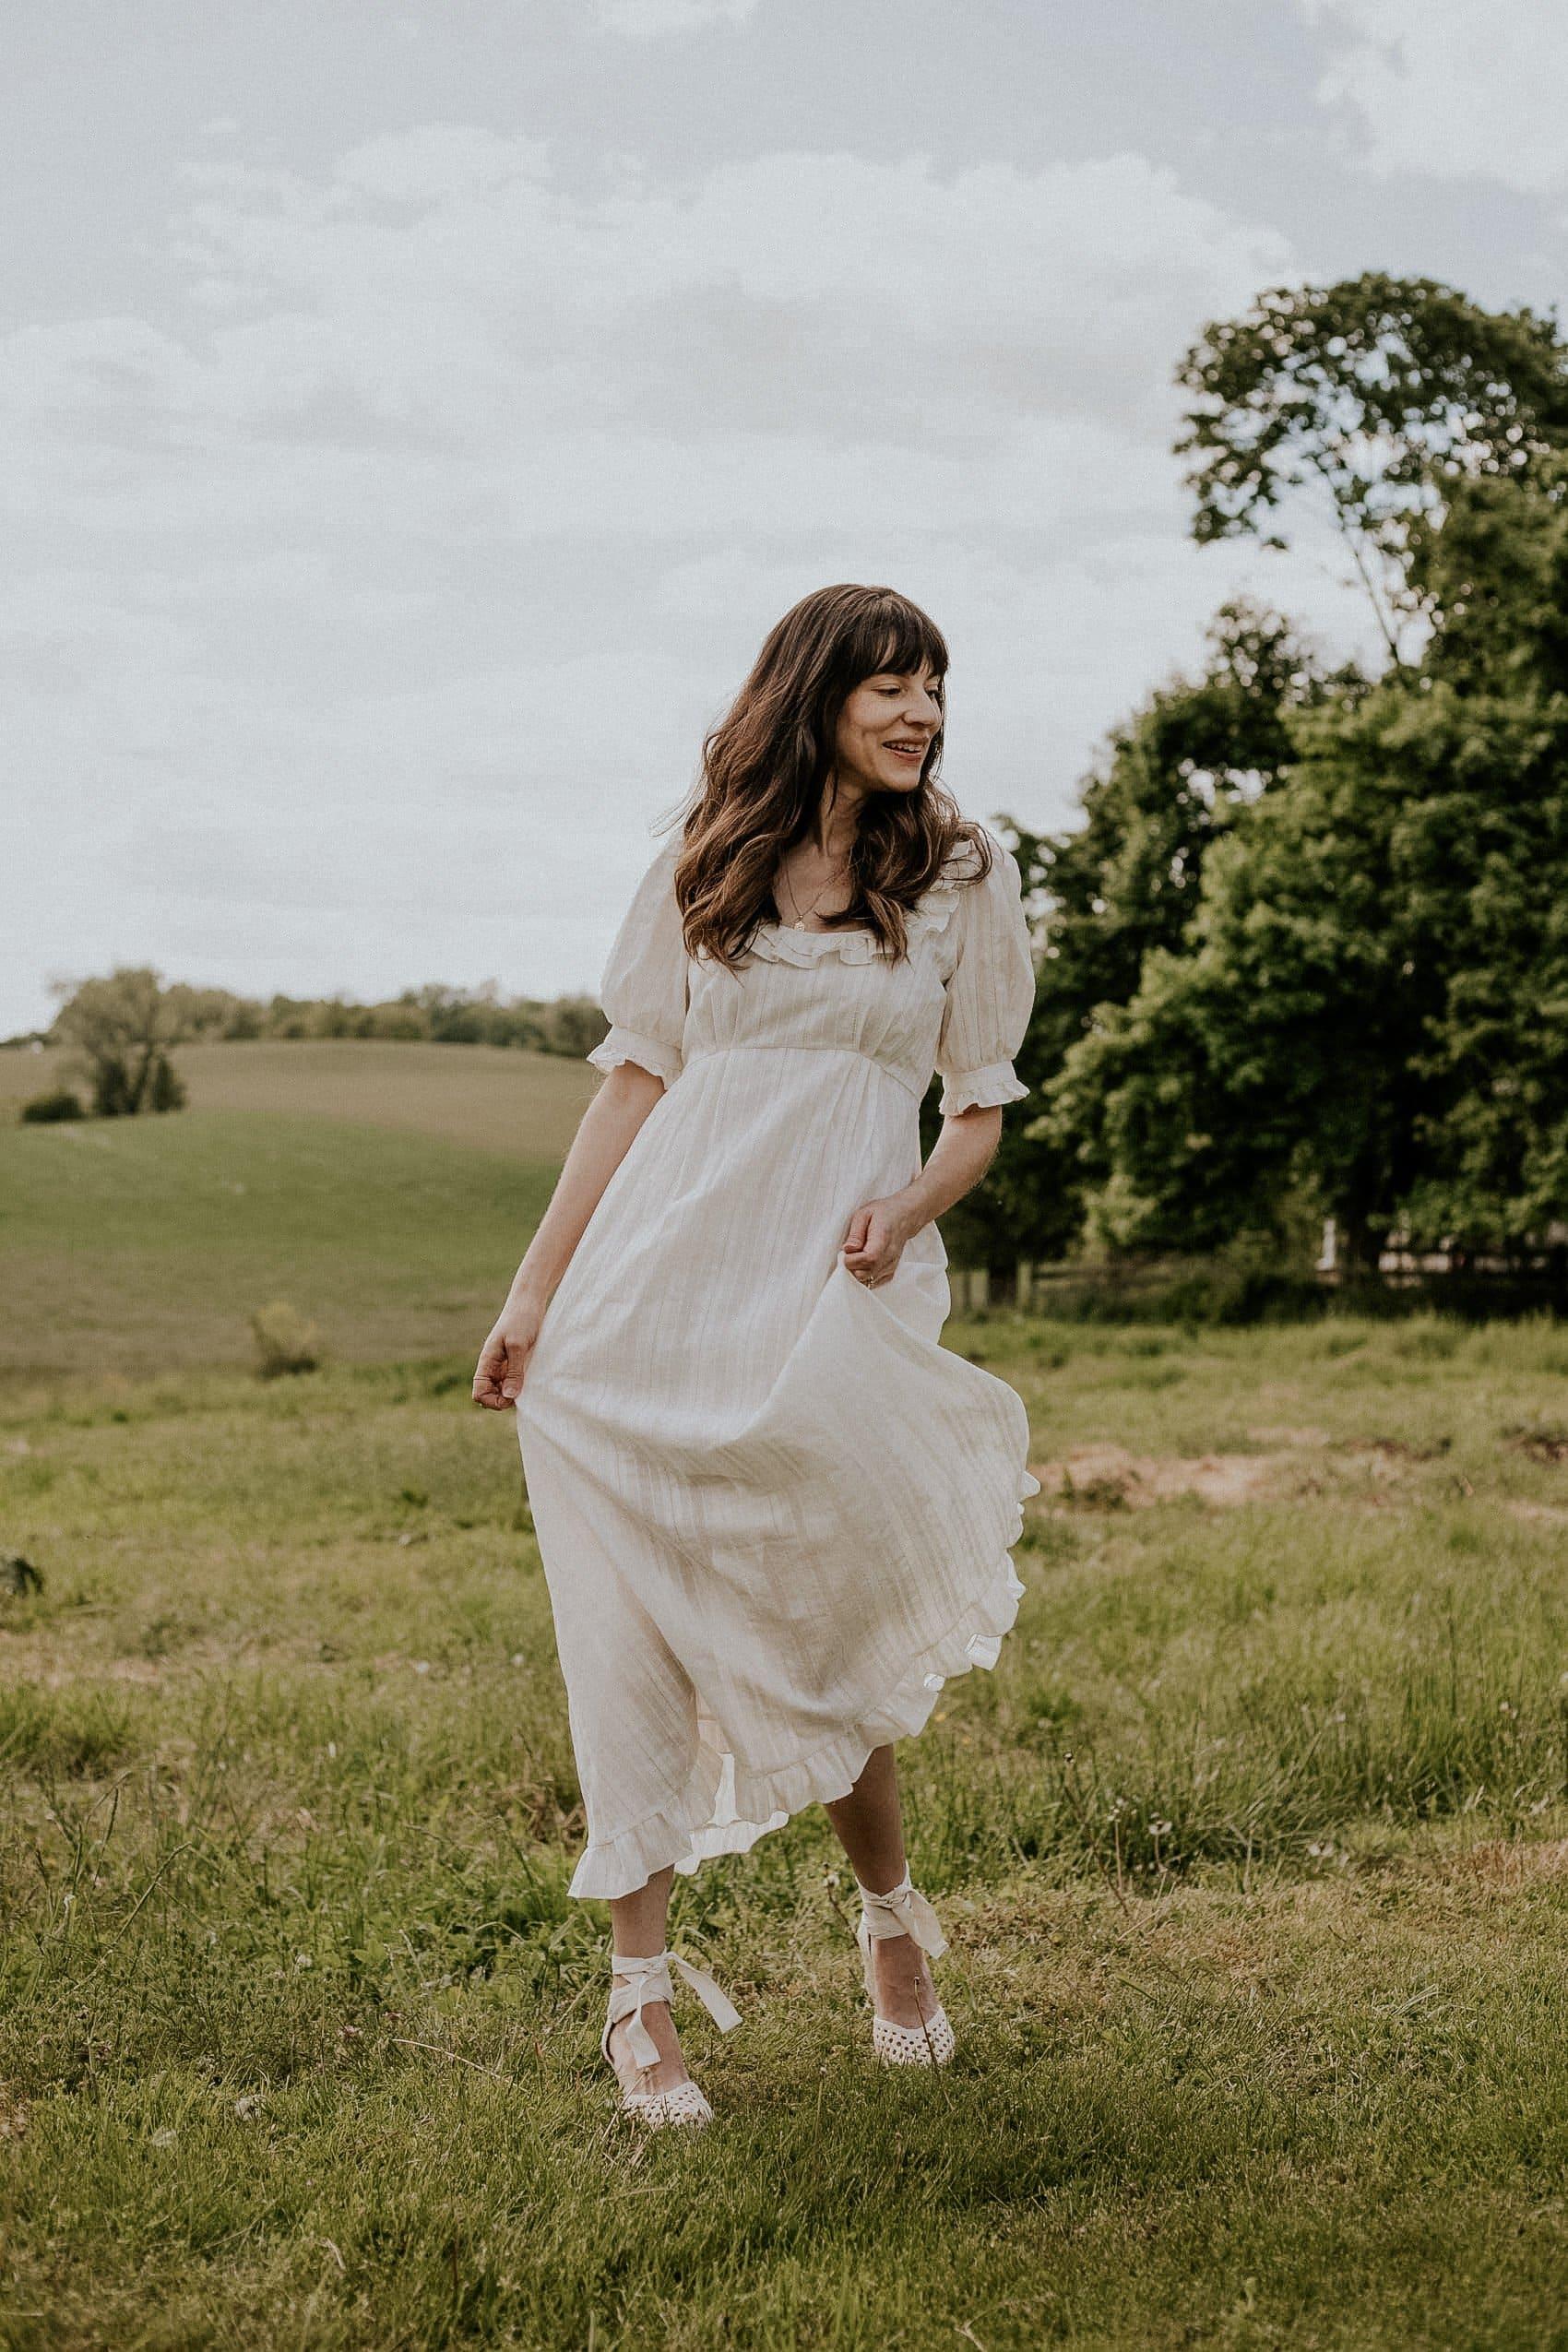 Bridgerton style white dress from Christy Dawn with Sezane espadrilles on woman in field